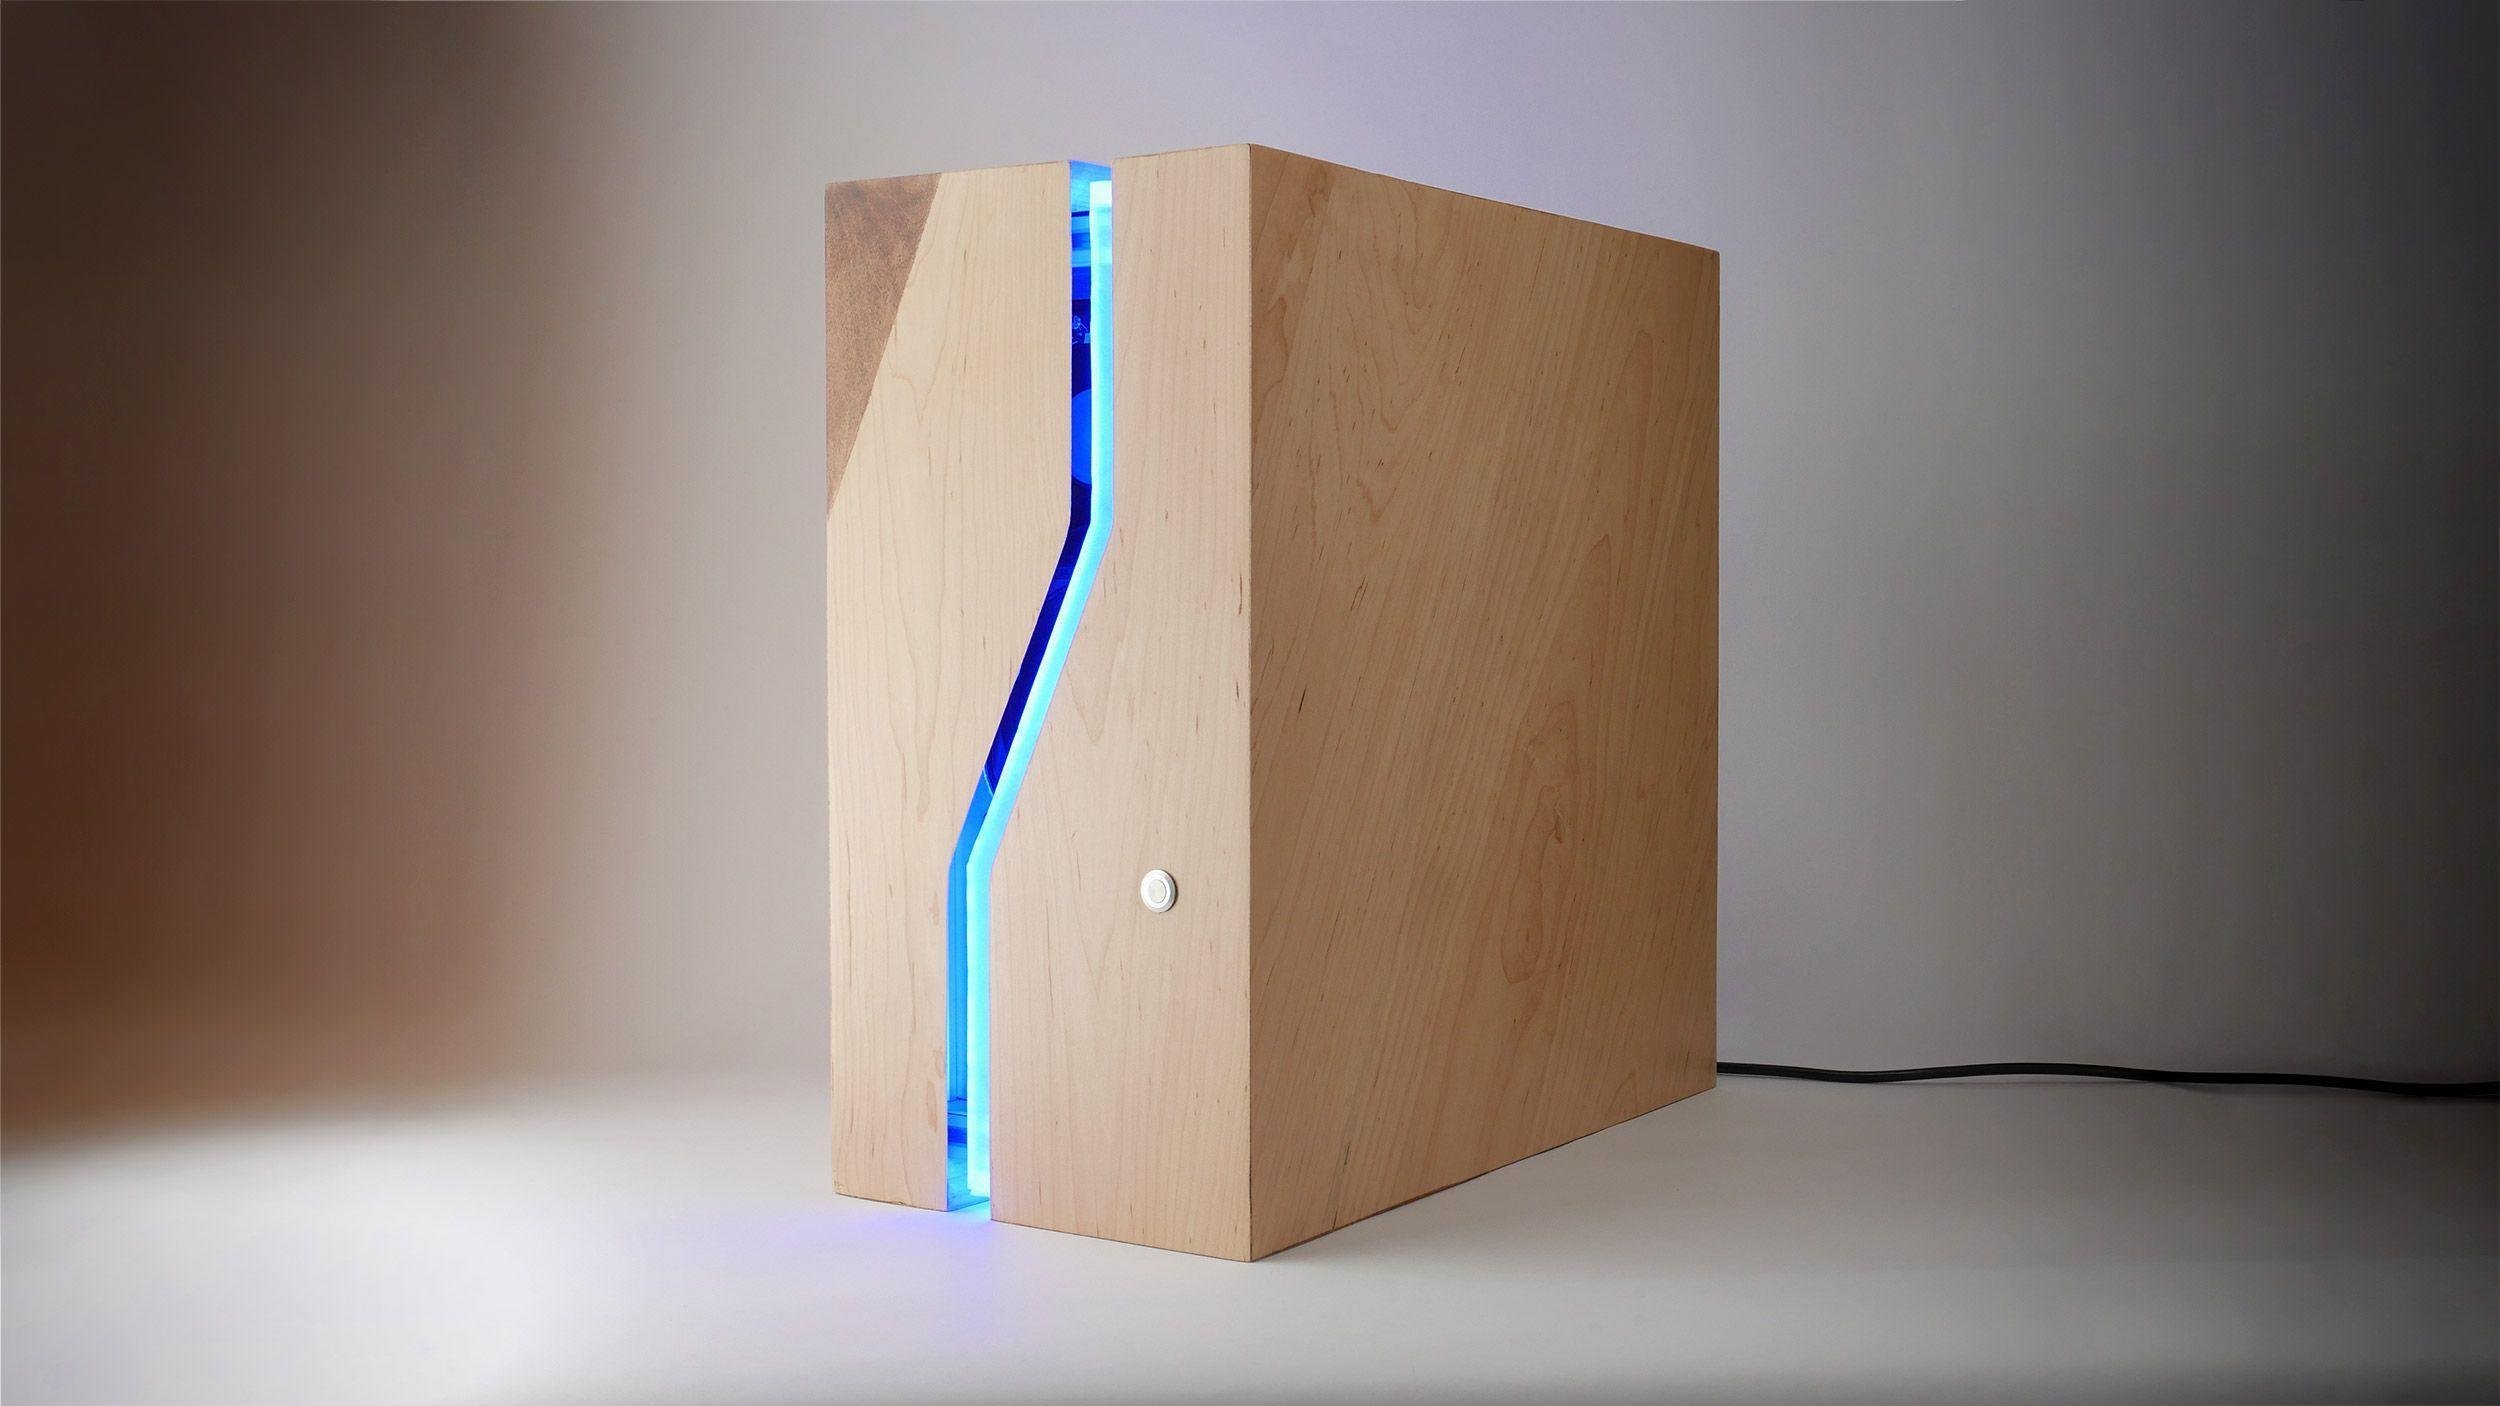 Wood Pc Case Minimalist Atx Enclosure Https Ift Tt 35htvy2 In 2020 Diy Computer Case Wood Computer Case Diy Pc Case